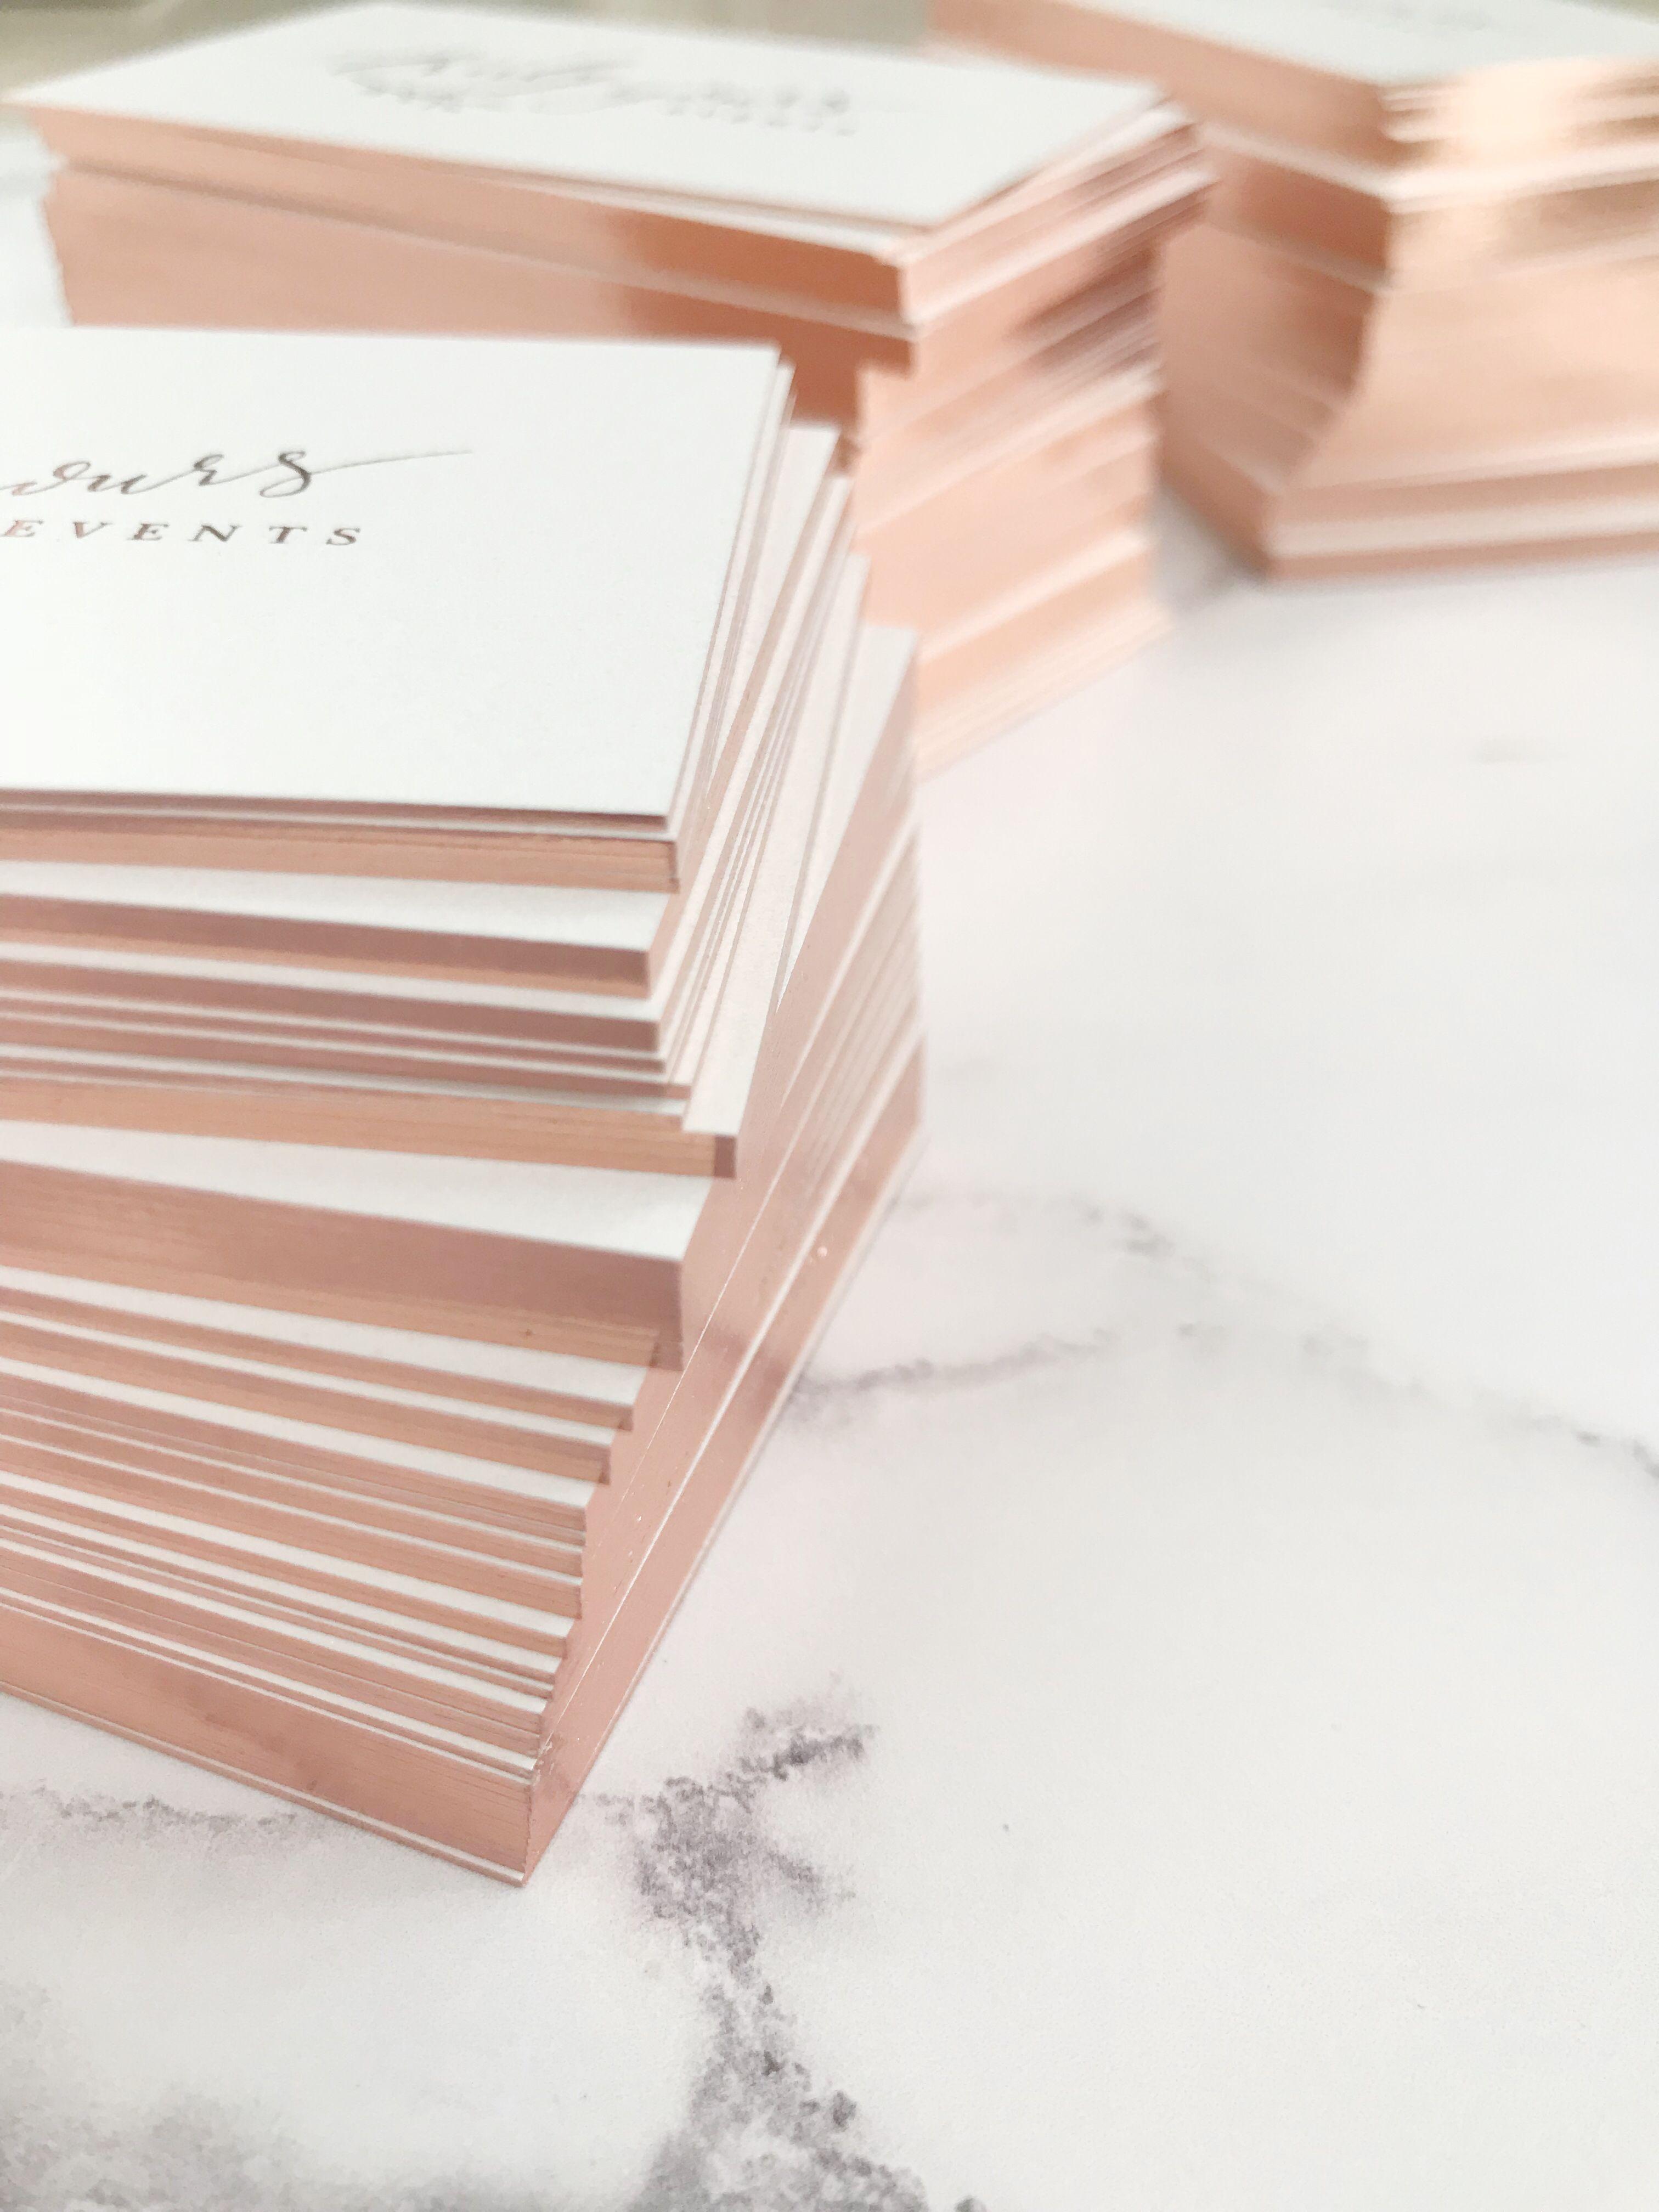 Rose Gold Gilt Edge Business Cards Pretty Business Cards Foil Business Cards Business Cards Beauty